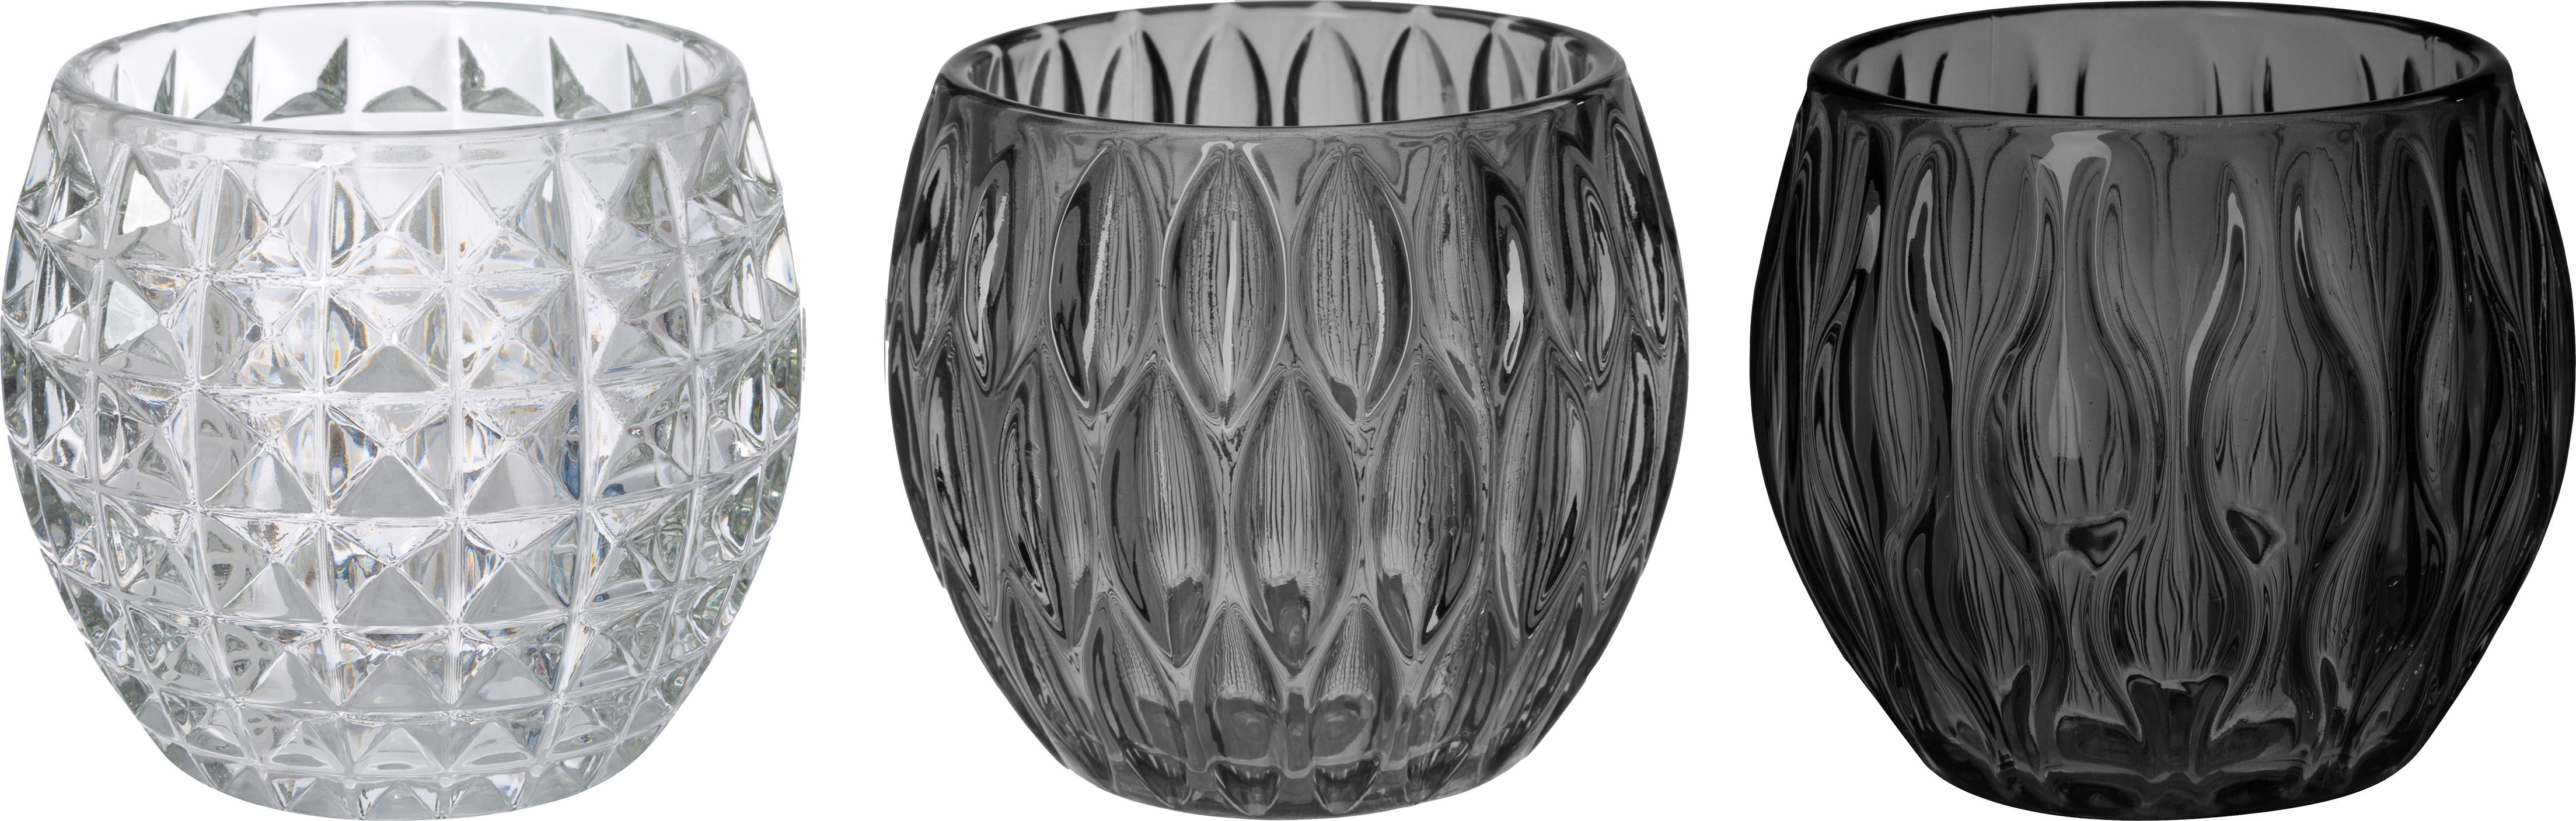 Set de portavelas Aliza, 3pzas., Vidrio, Gris, transparente, Ø 10 x Al 9 cm